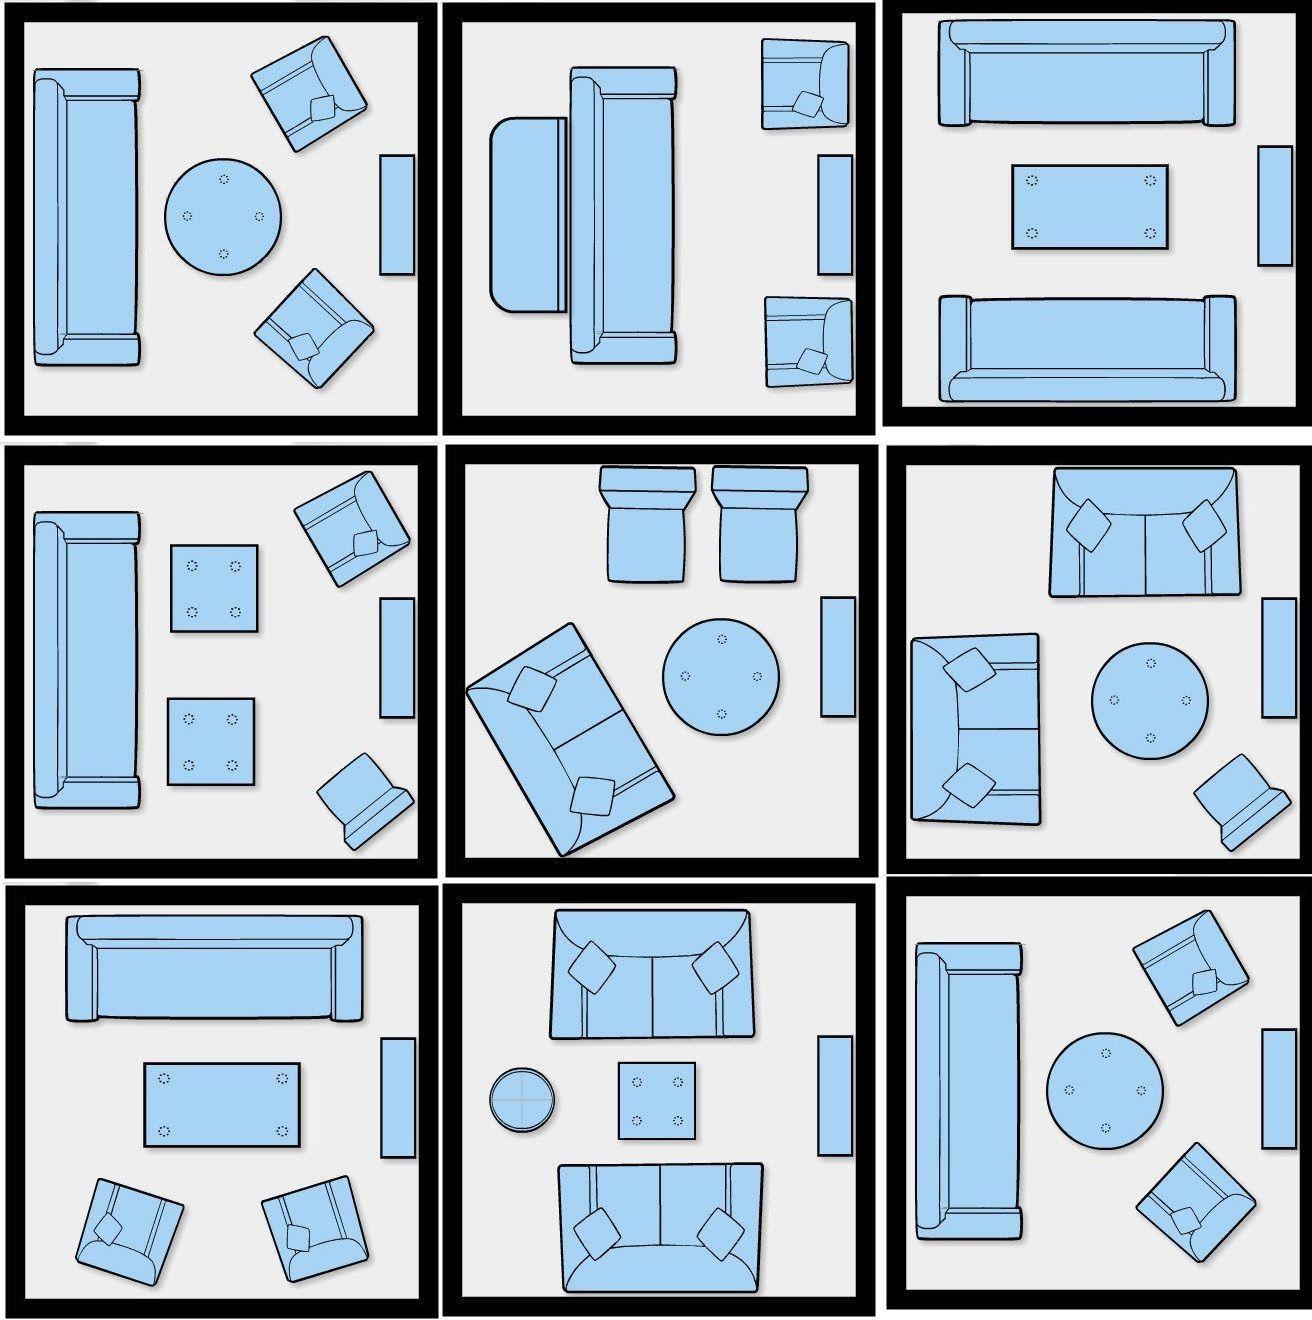 image result for 12 ft12 ft furniture layout | deck / porch